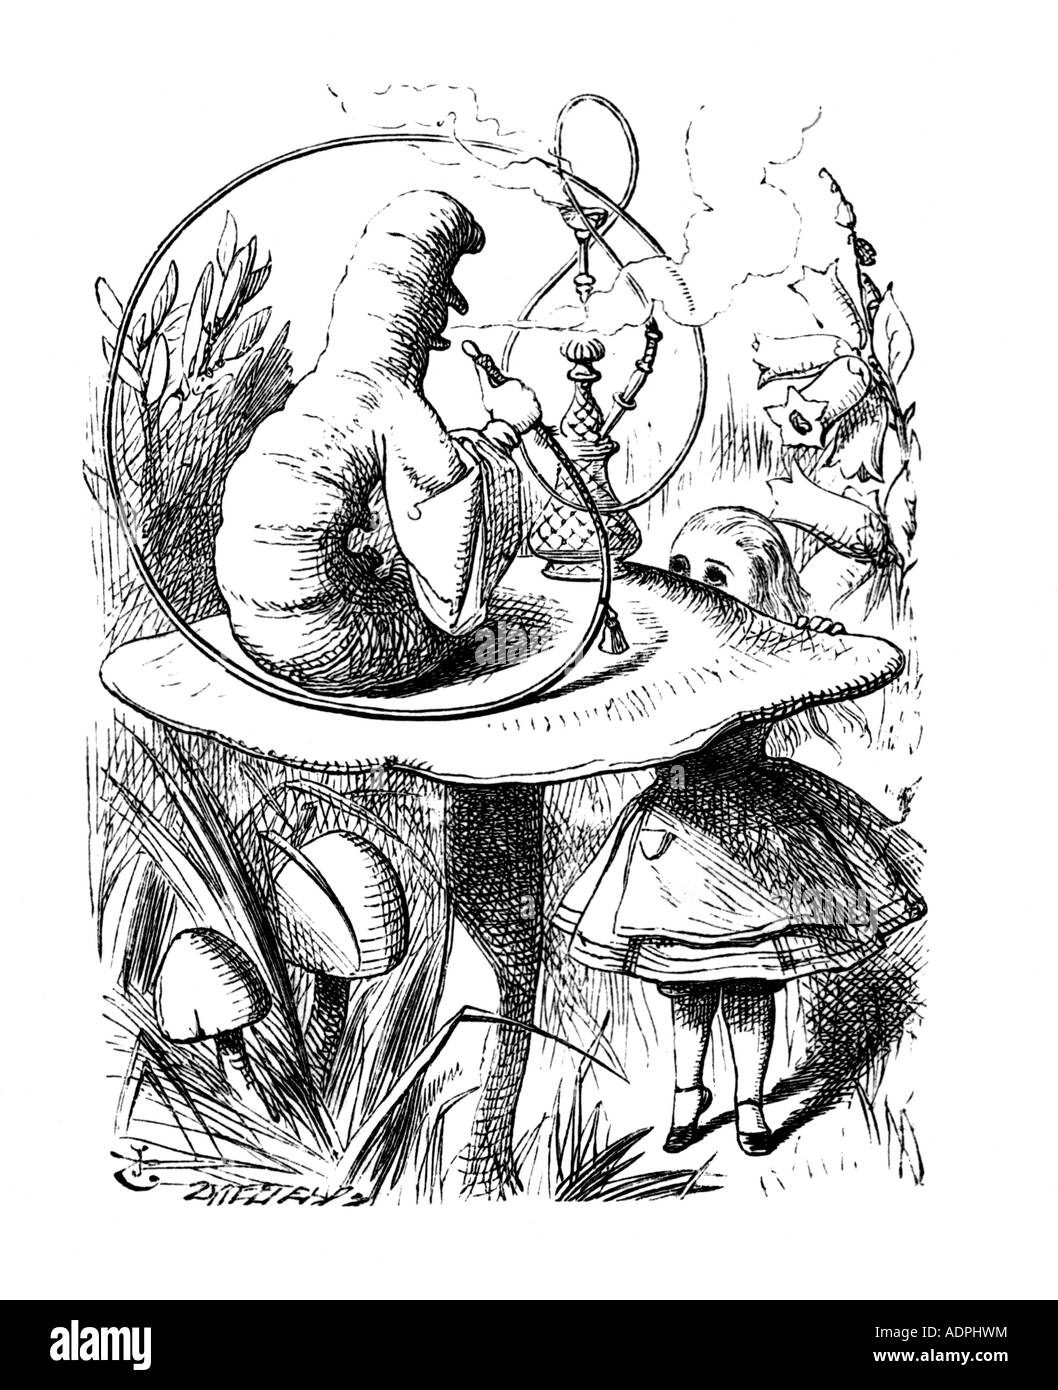 Alice in Wonderland by Lewis Carroll 28